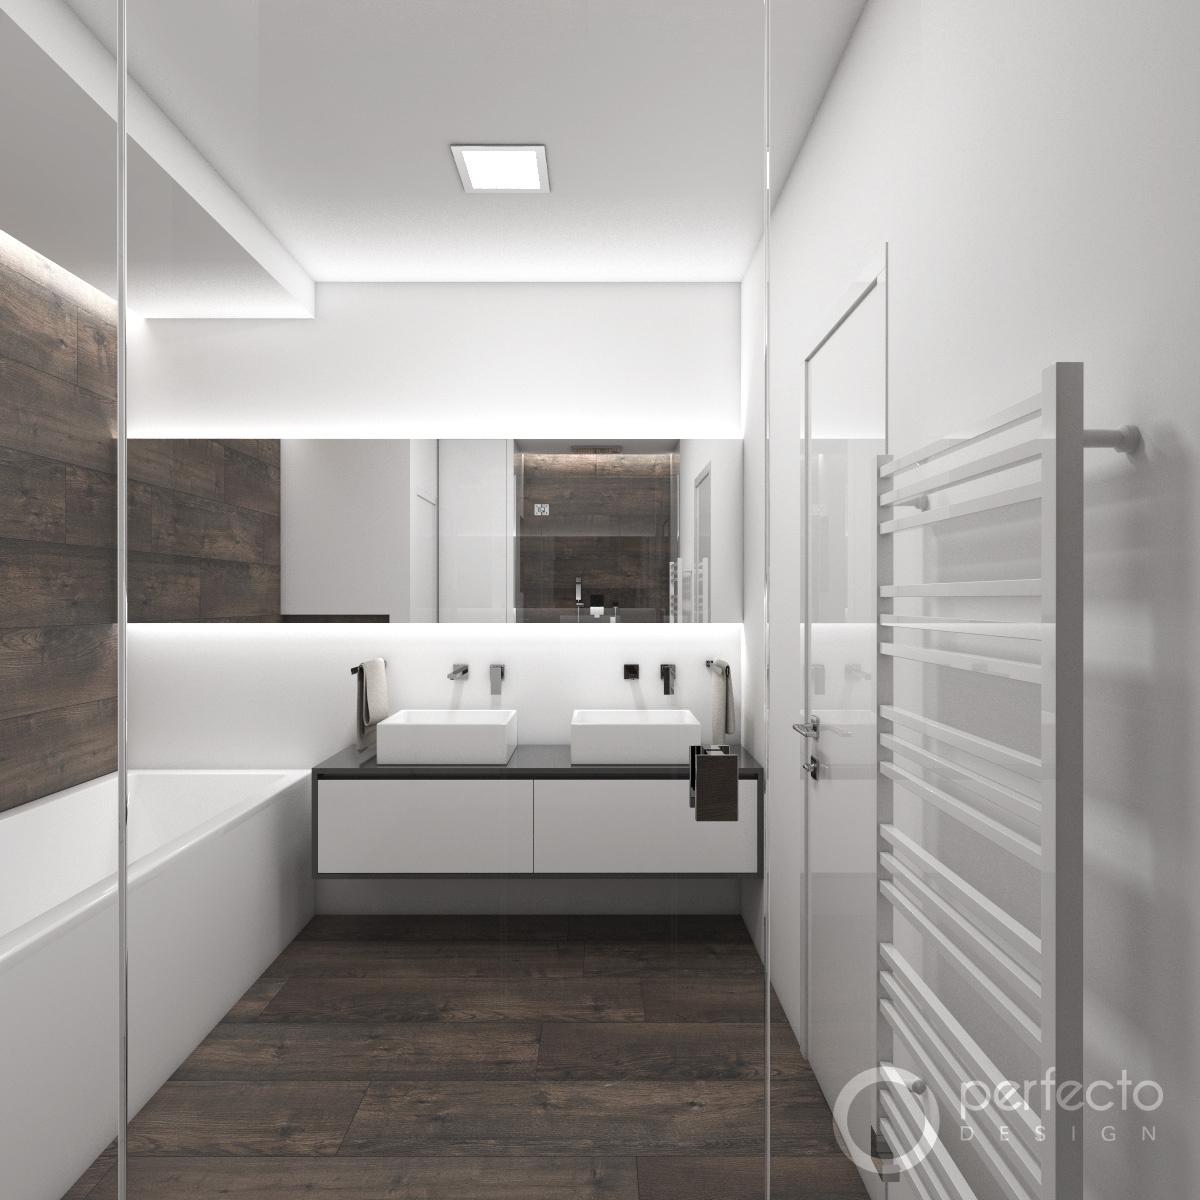 Badezimmer Modernes Design  Jtleigh.com - Hausgestaltung ...